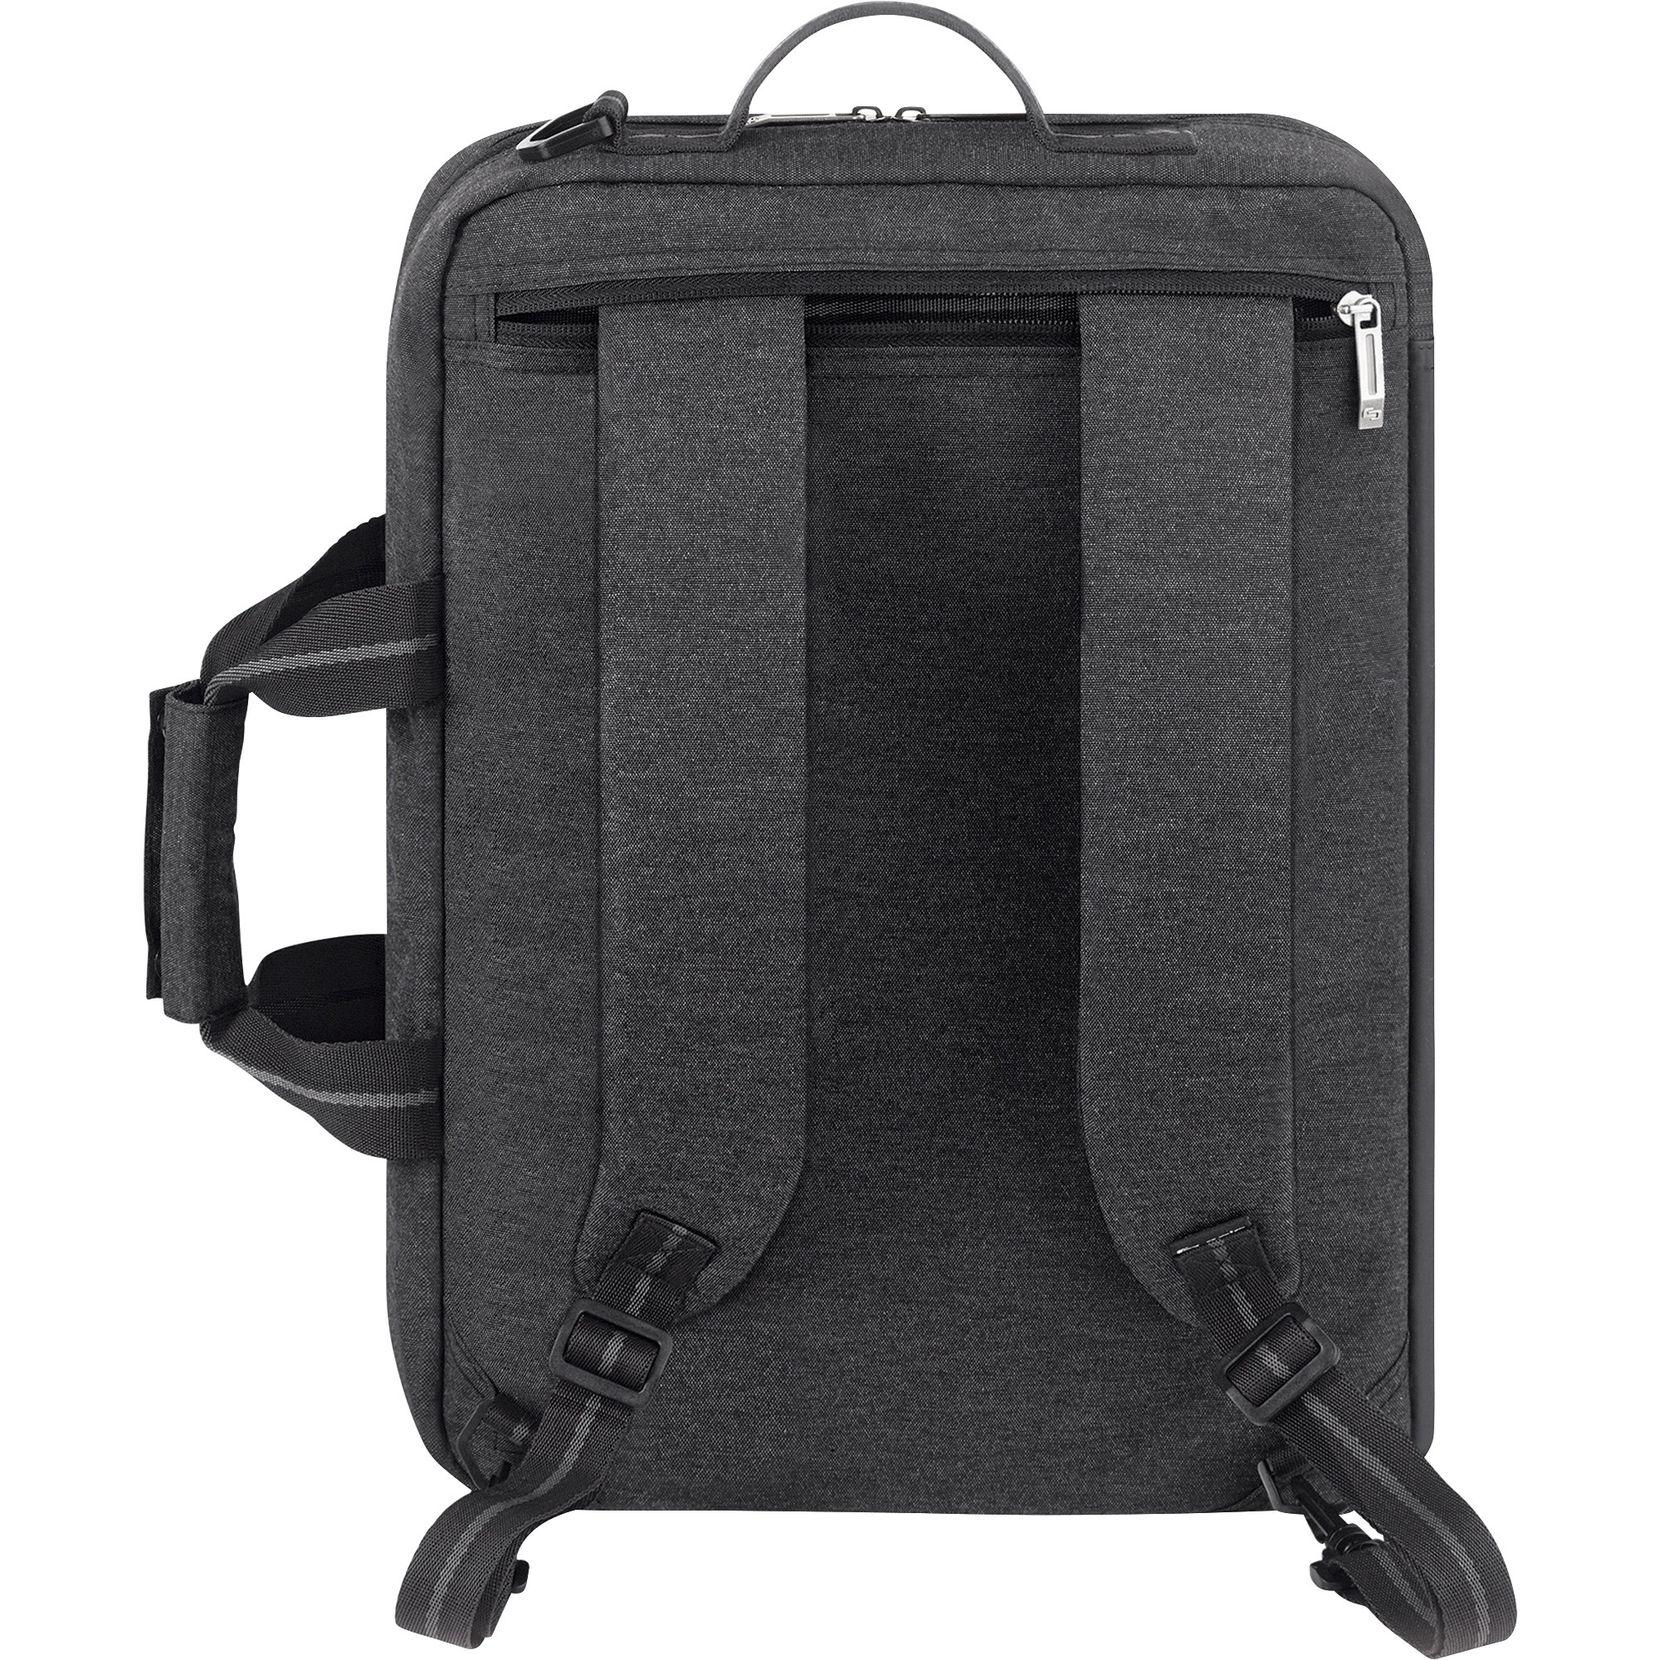 Solo Duane Hybrid bag